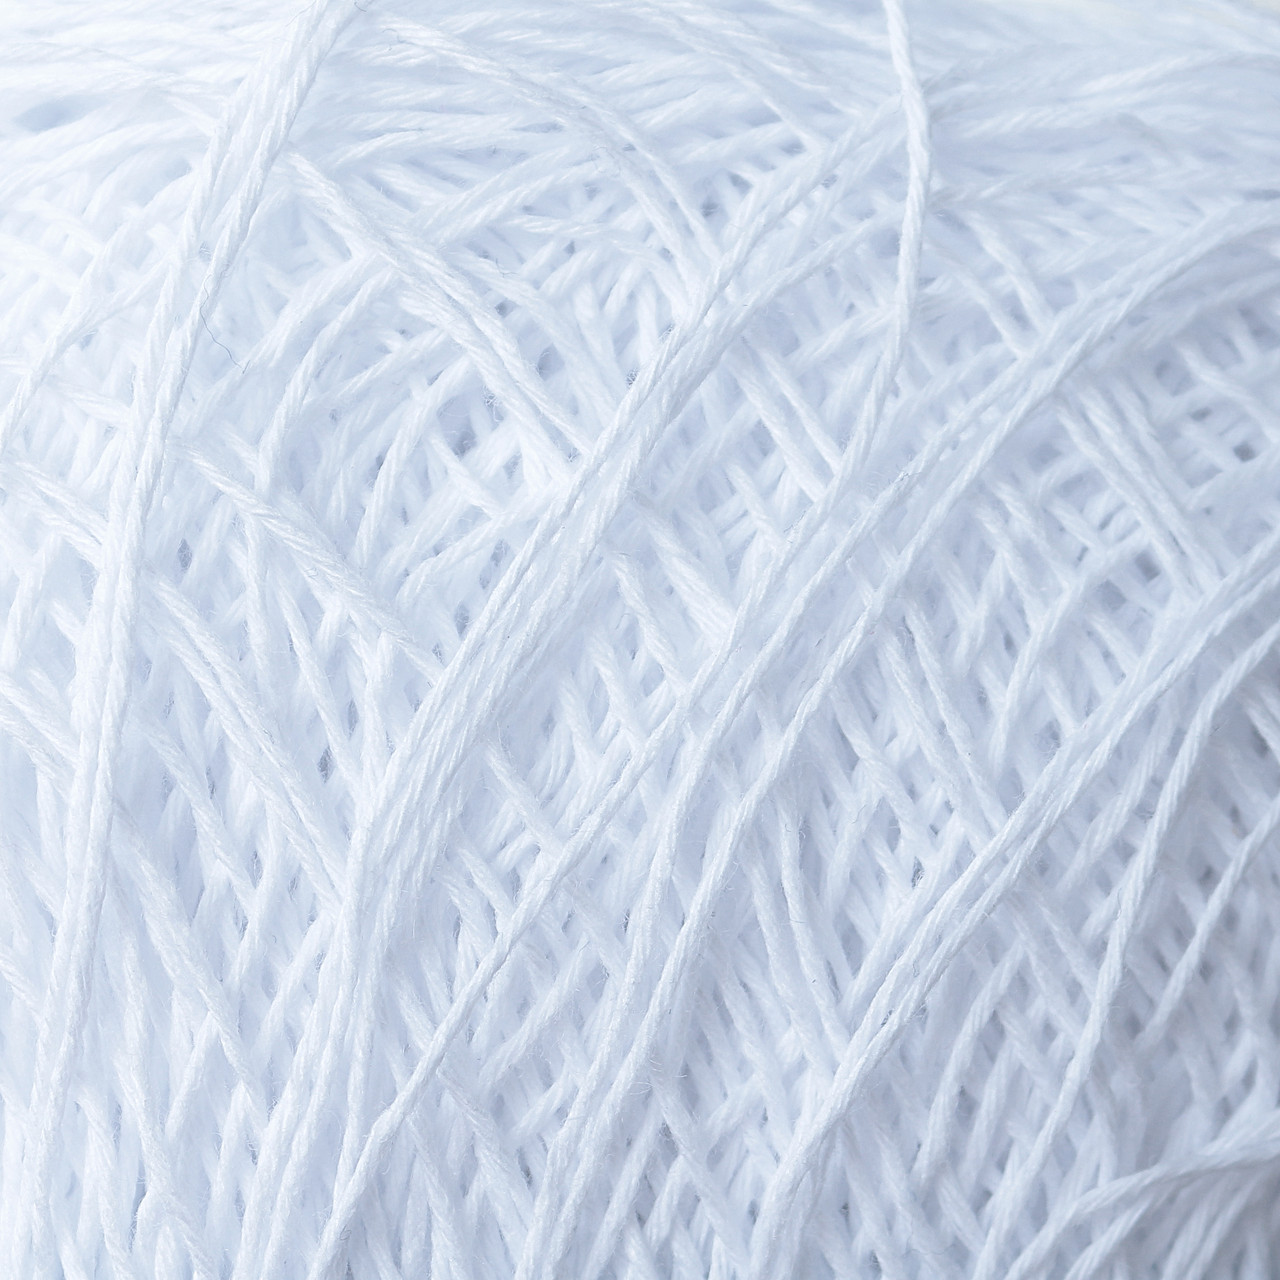 Пряжа Вивчари Этно-Коттон Классик 600 м, цвет 001 белый